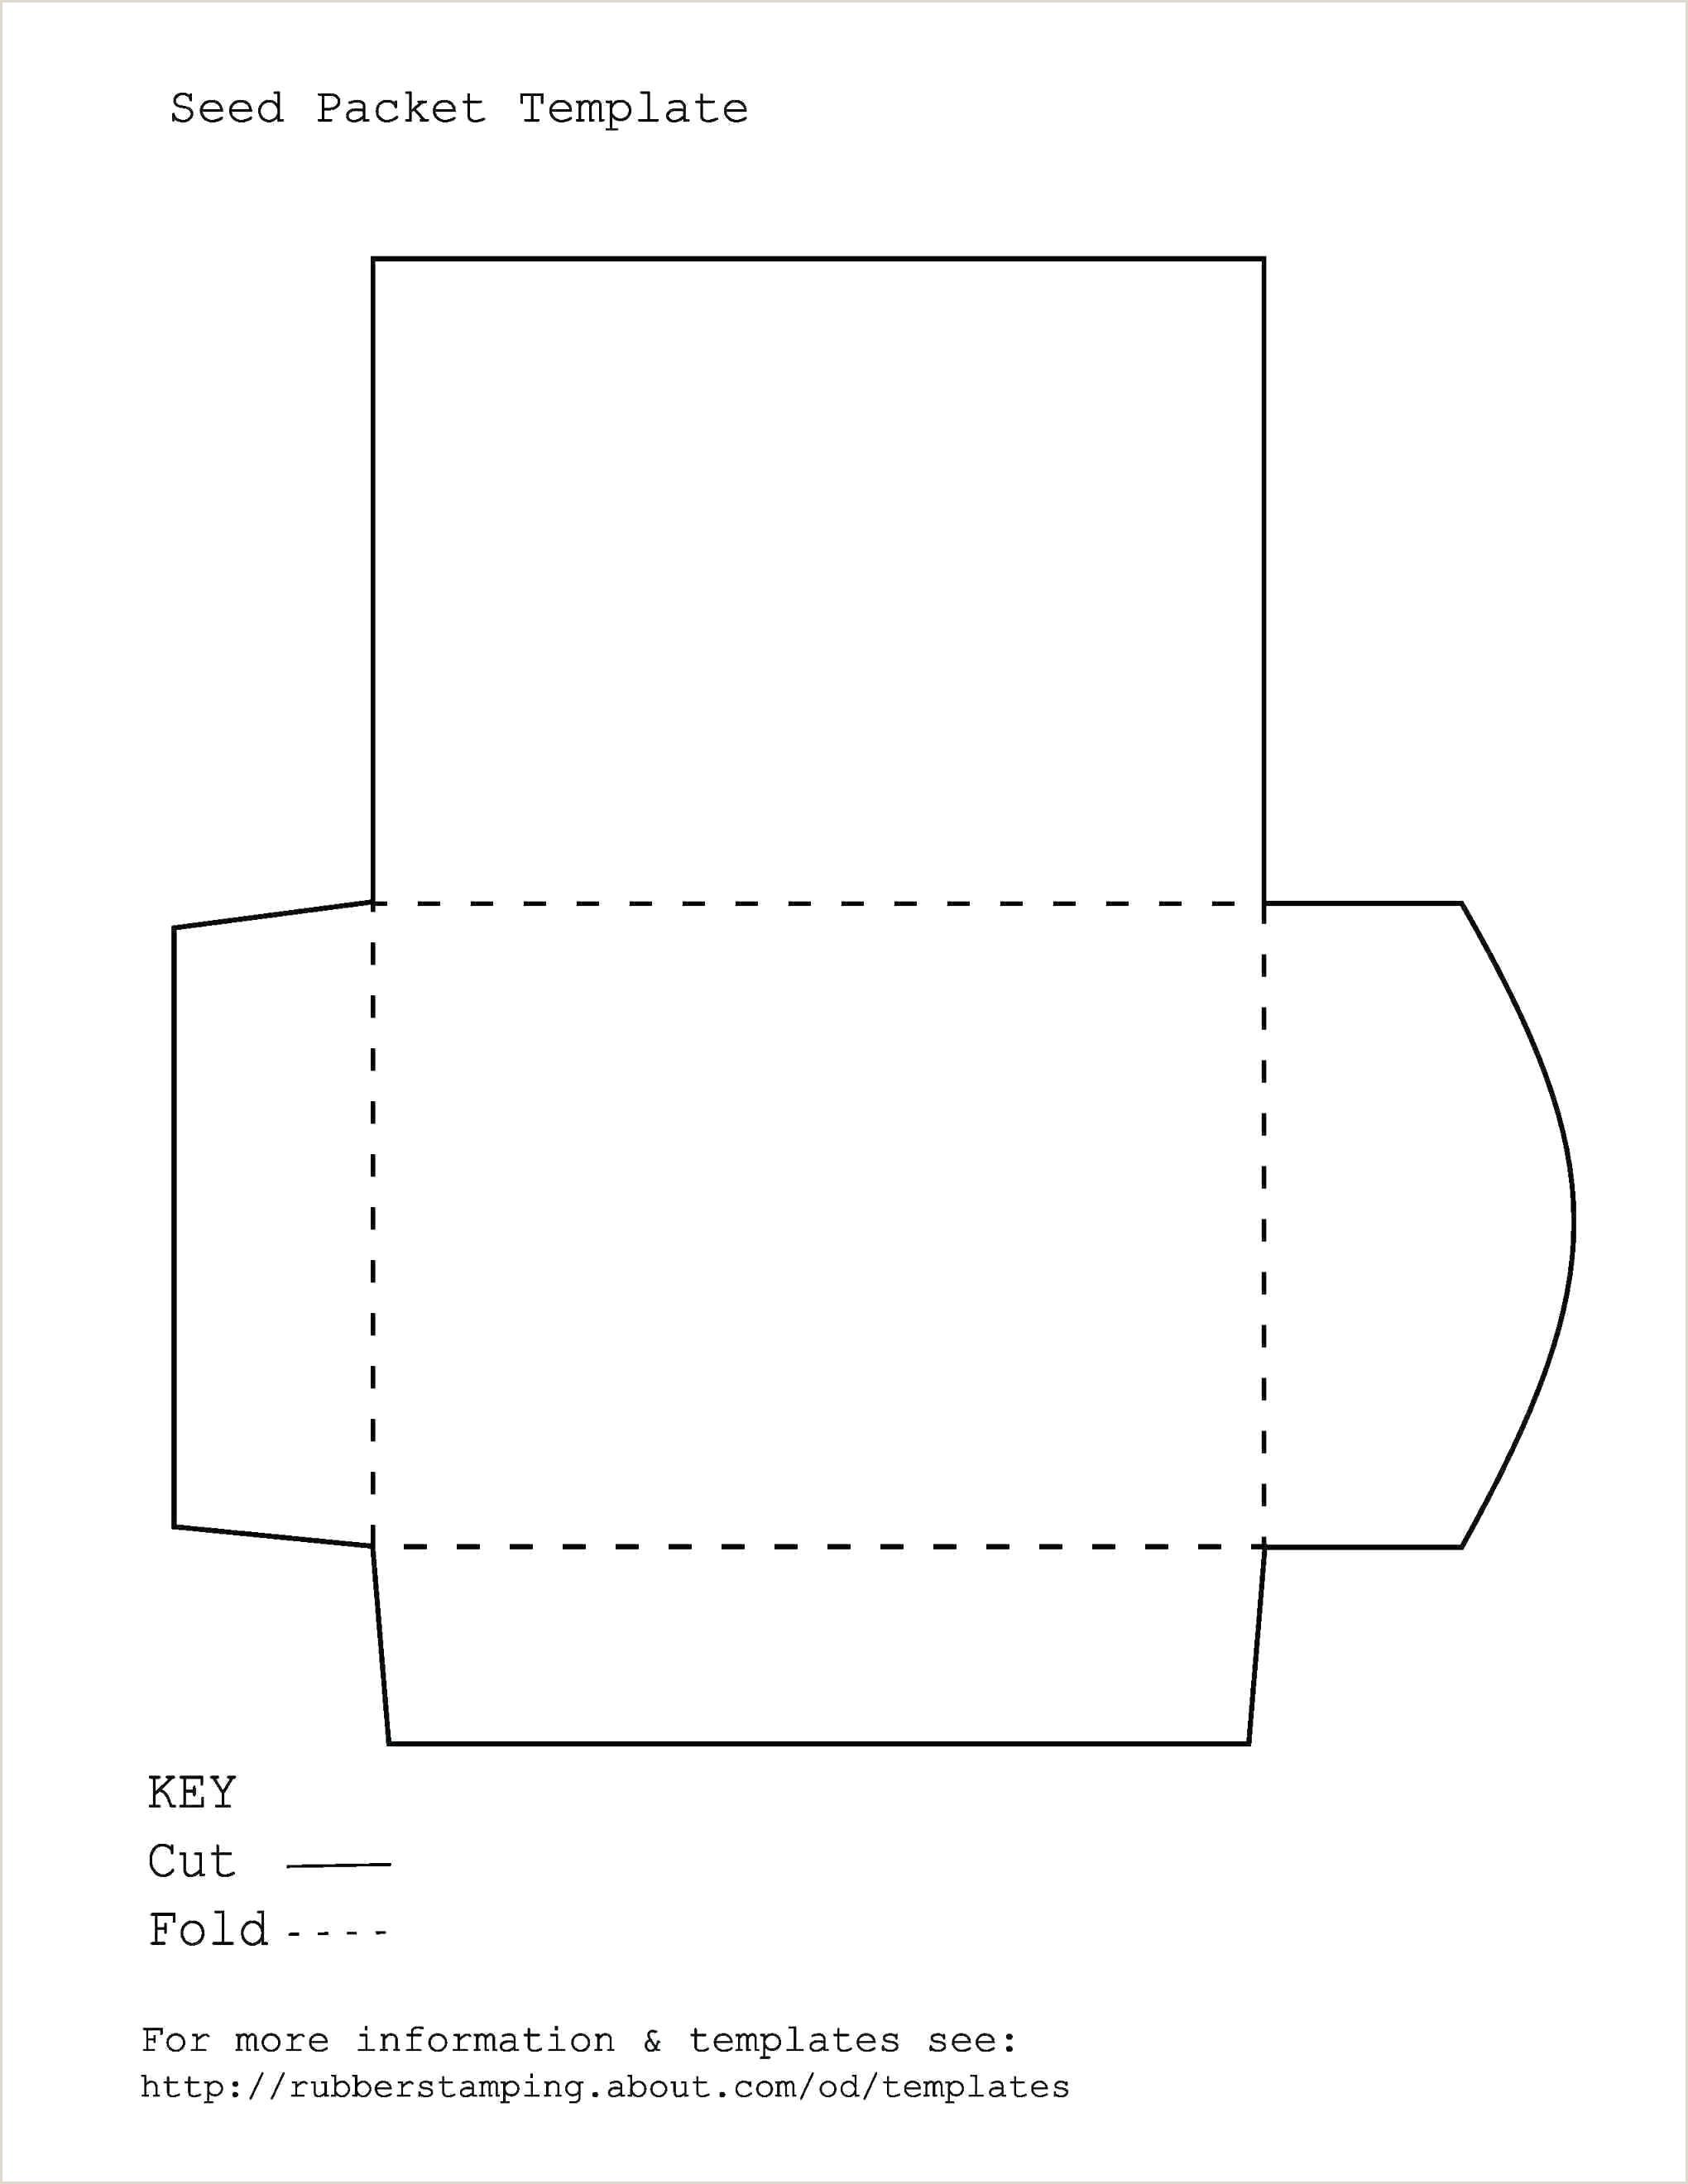 Blank Nursing Concept Map Template Nursing Concept Map Examples – thermalprint